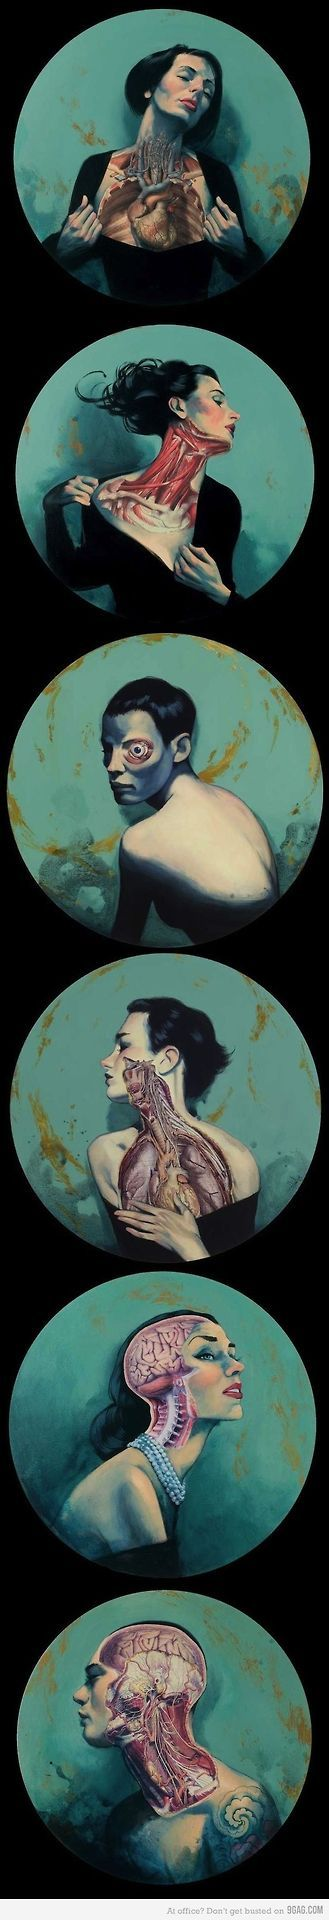 'Anatomía Humana' de Fernando Vicente